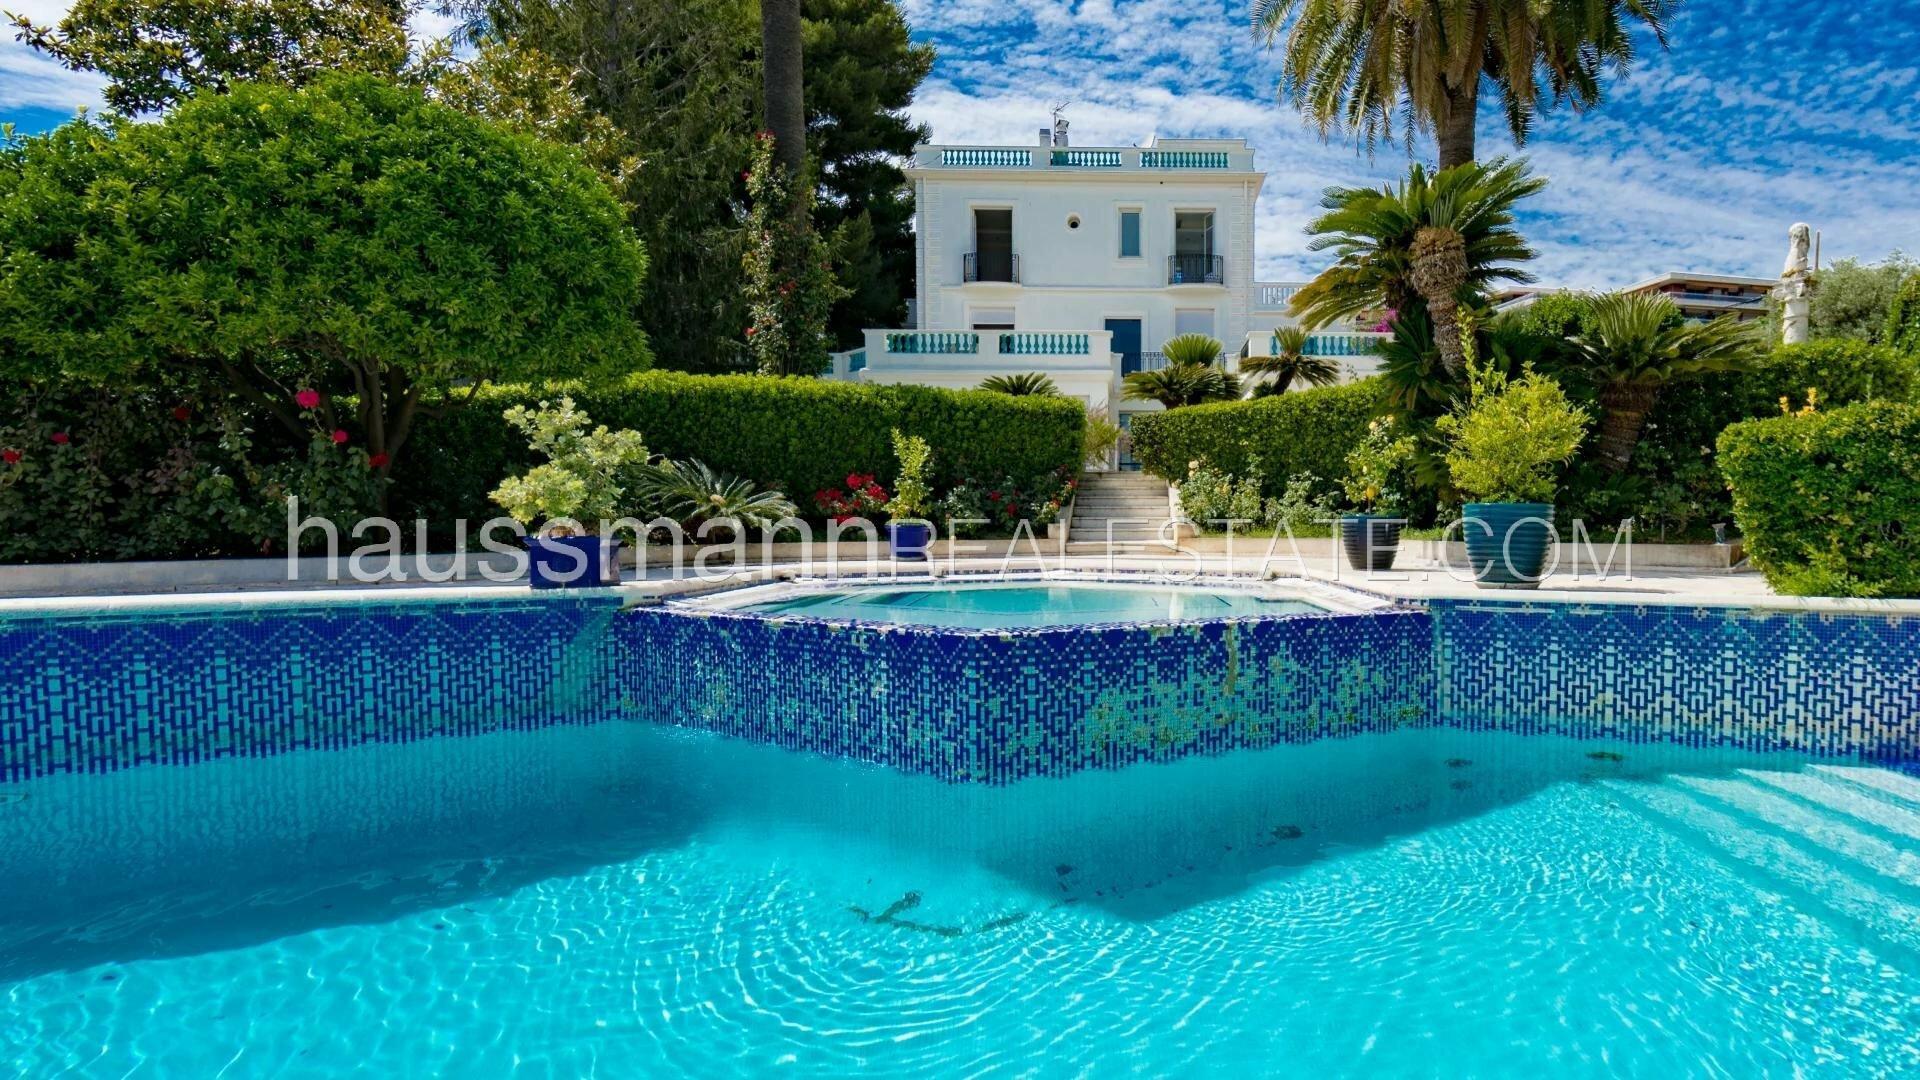 Villa in Nice, Provence-Alpes-Côte d'Azur, France 1 - 11533341